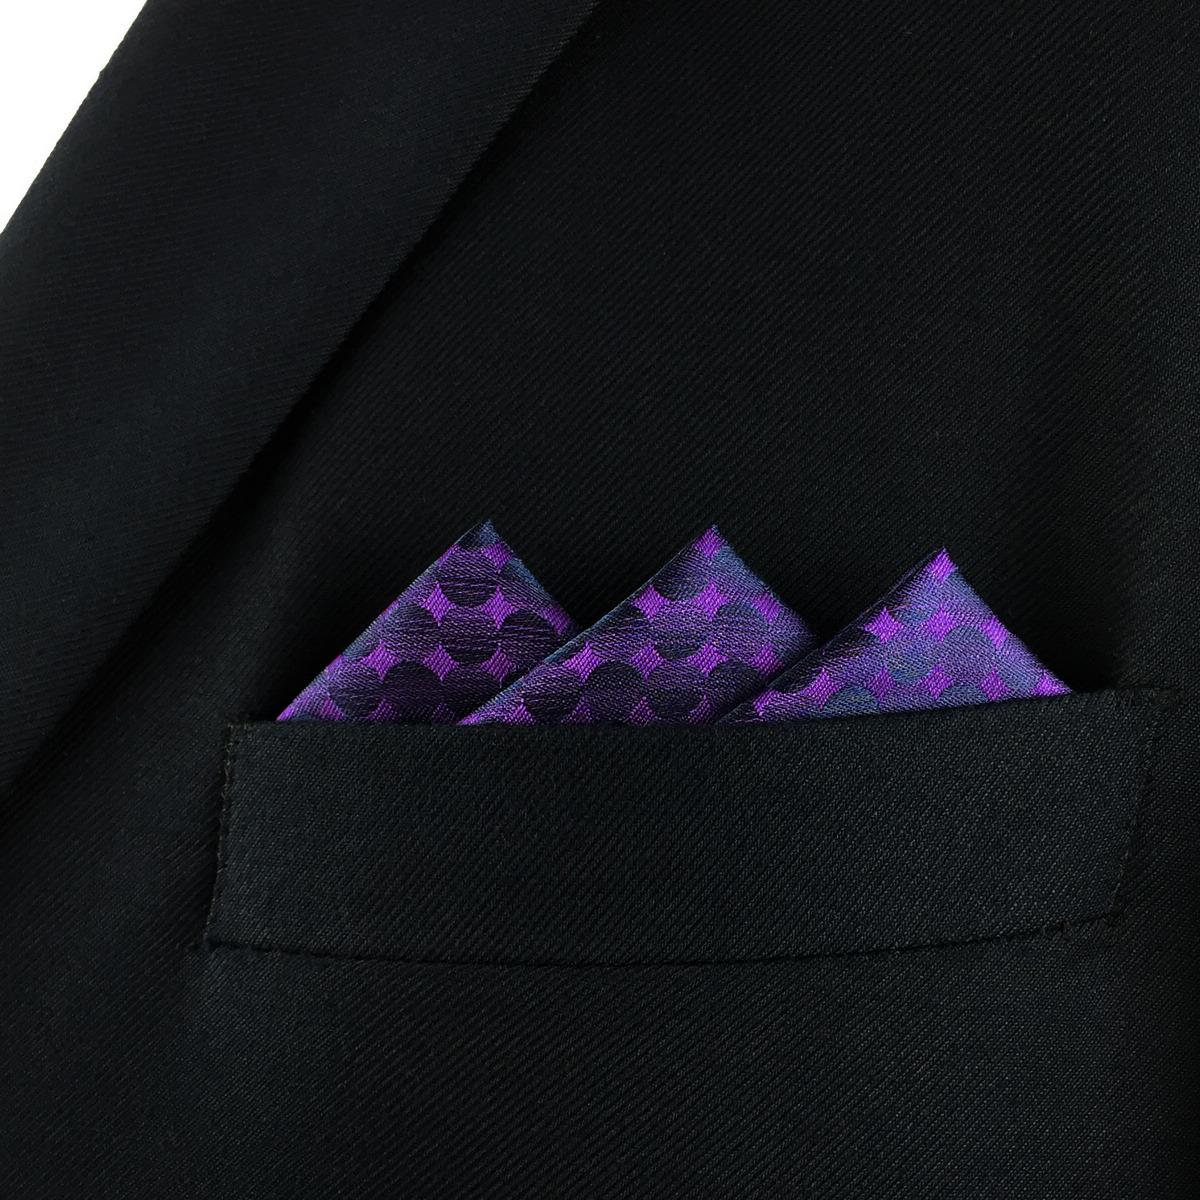 S/&W SHLAX/&WING Solid Purple Men/'s Silk Pocket Square Handkerchief Fashion